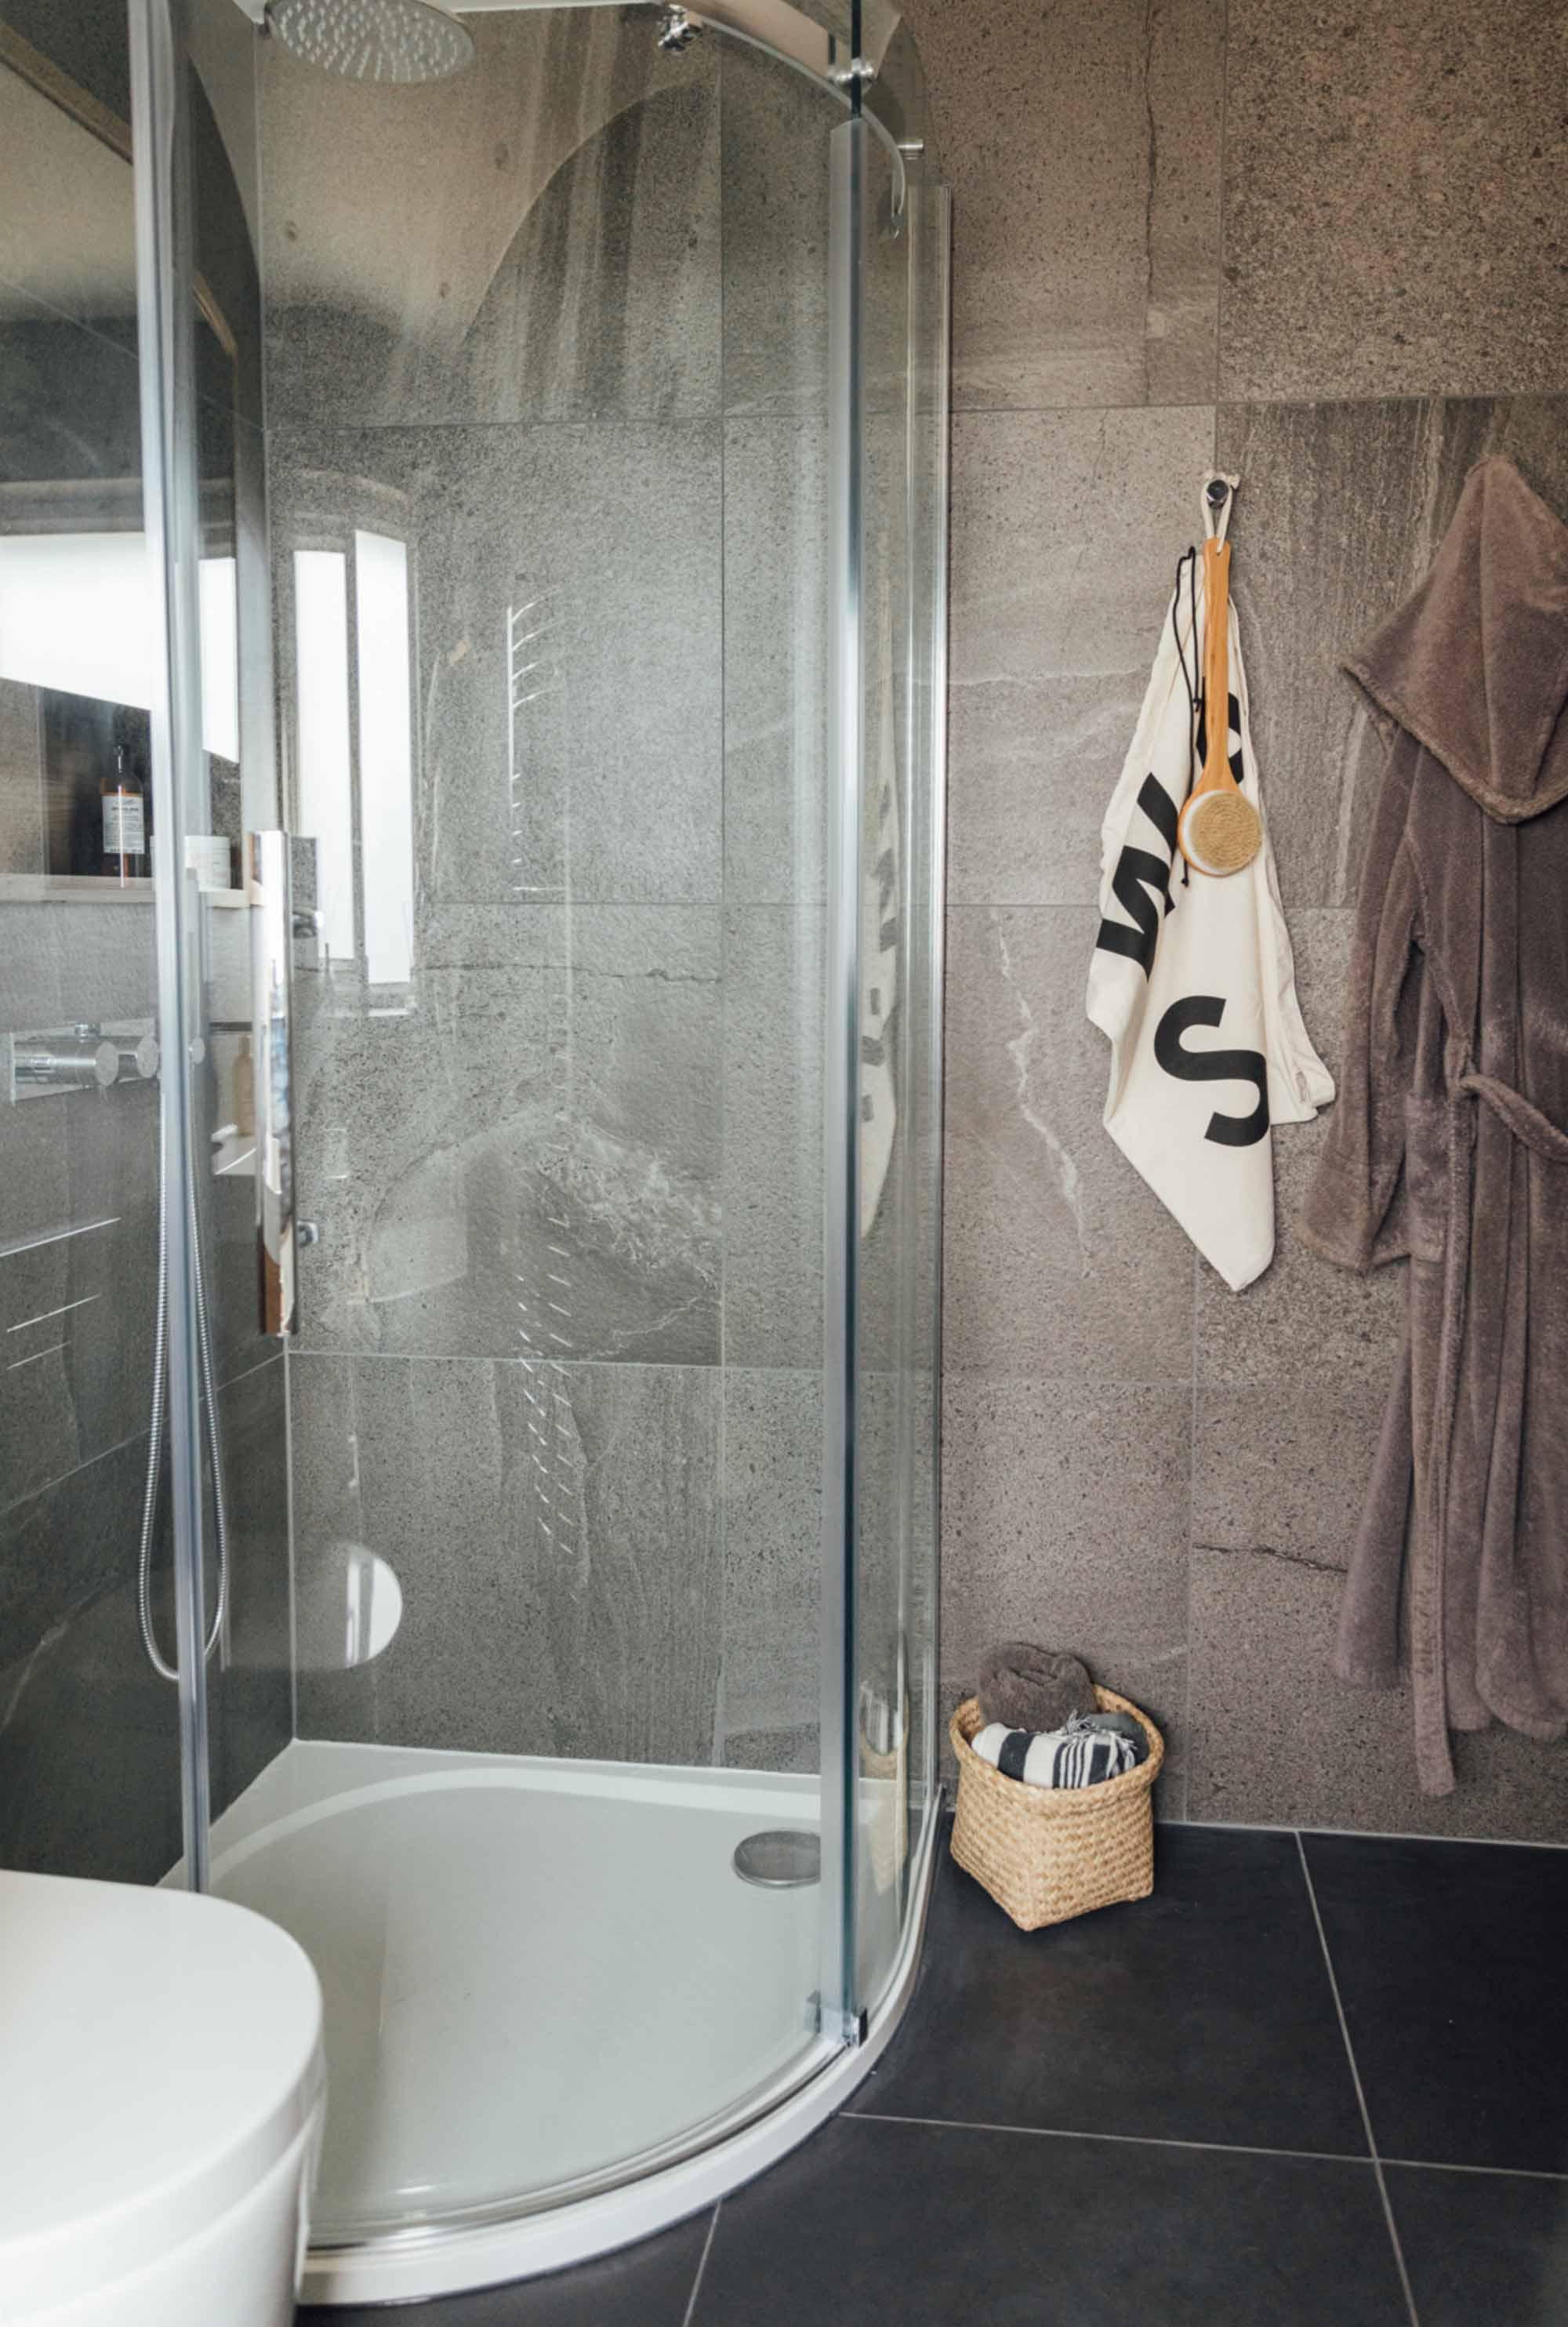 2 bathroom-with-black-floor-tiles-and-grey-wall-tiles.jpg